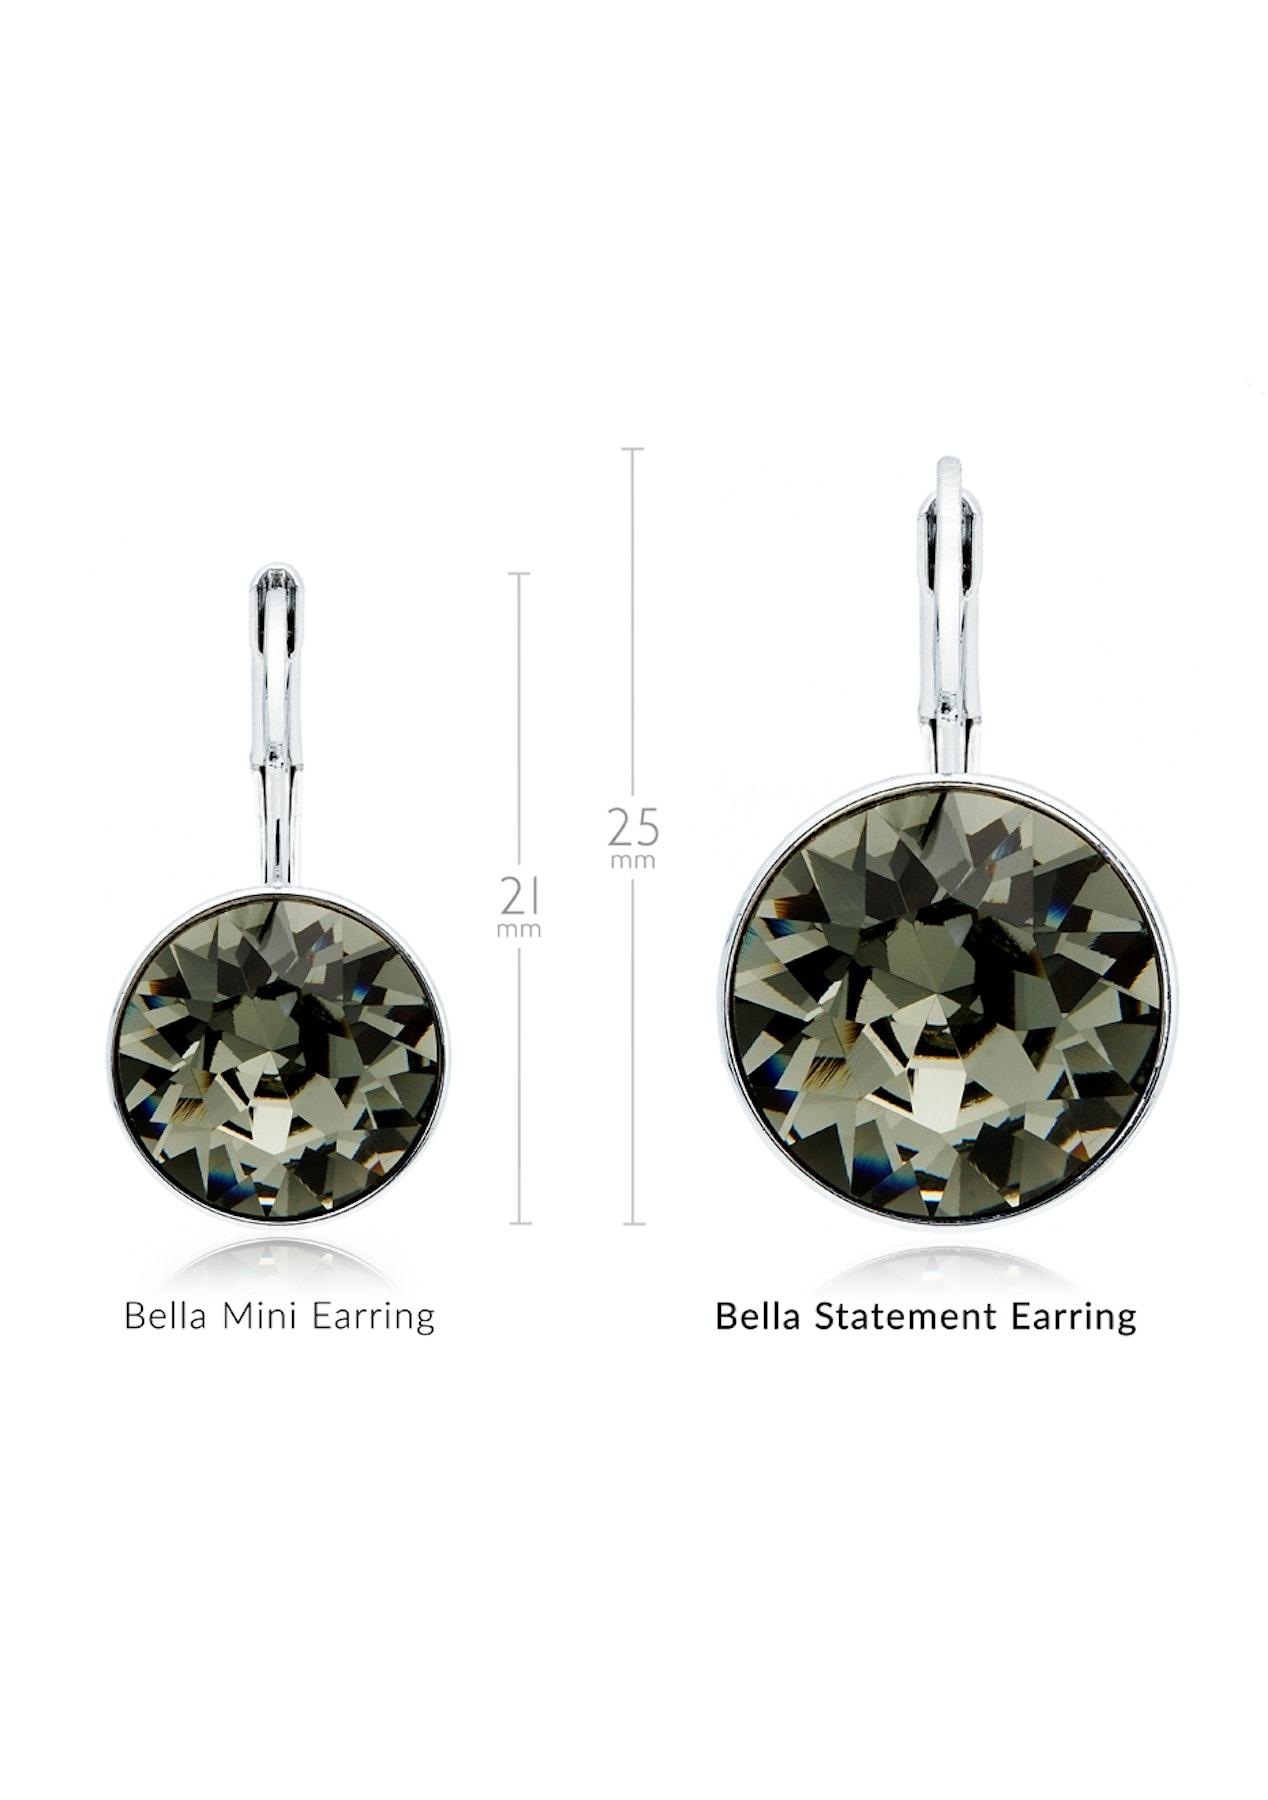 b1da612e6d7 Krystal Cotoure - Bella Drop Earrings with Black Diamond Swarovski Crystals  Bridal WGP - My Jewellery Store Swarovski Elements Jewellery Under $40 -  Onceit